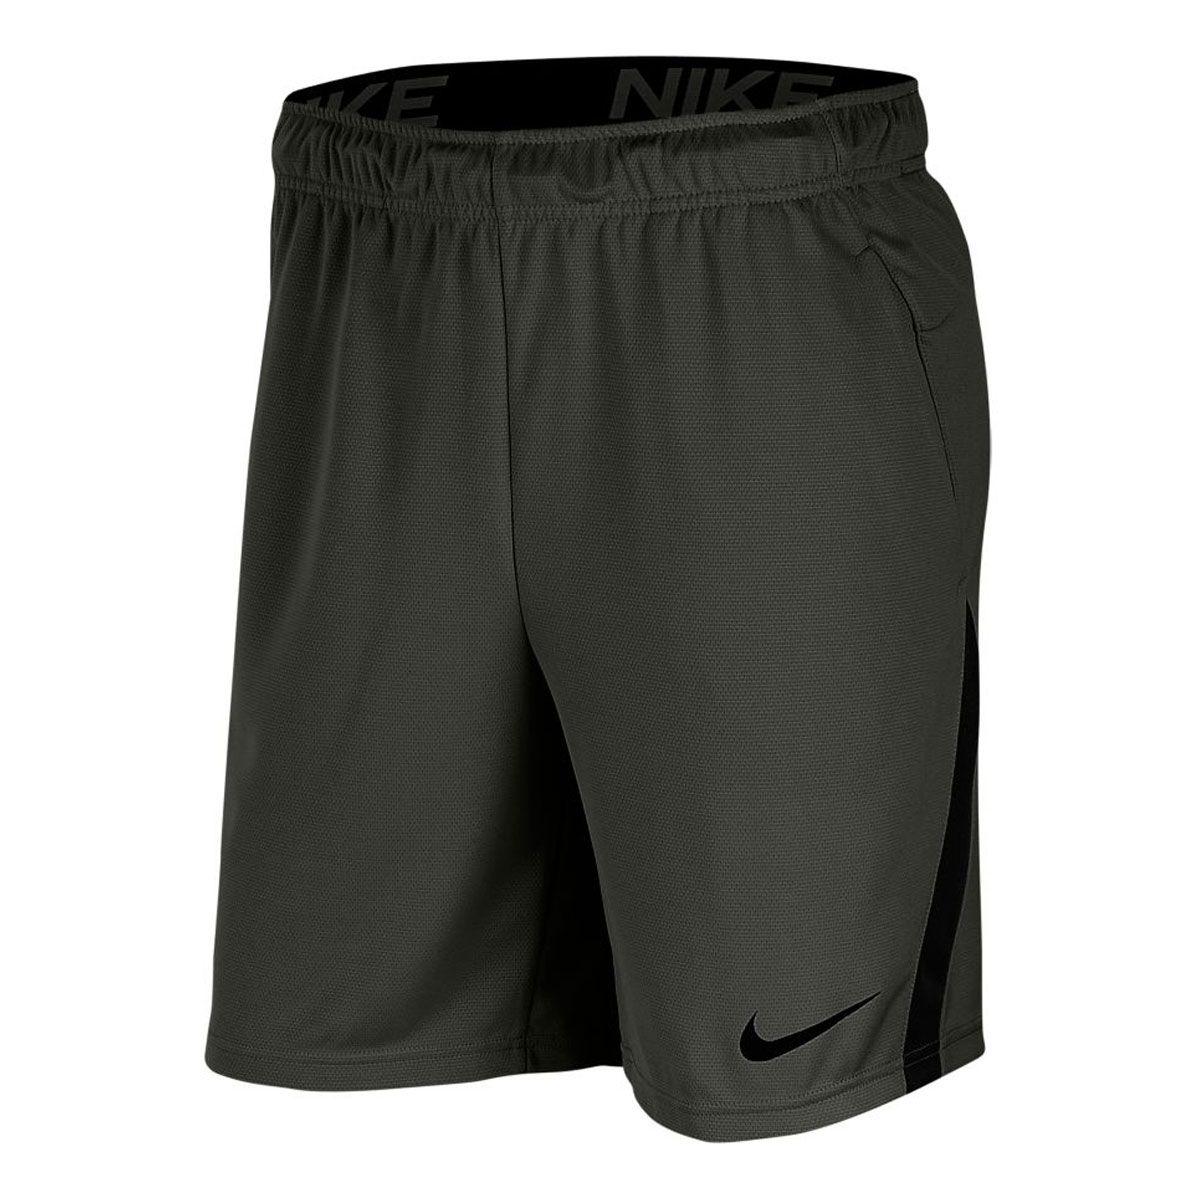 Nike Pantaloncini Short Dry 50 Uomo Grigio Scuro Nero